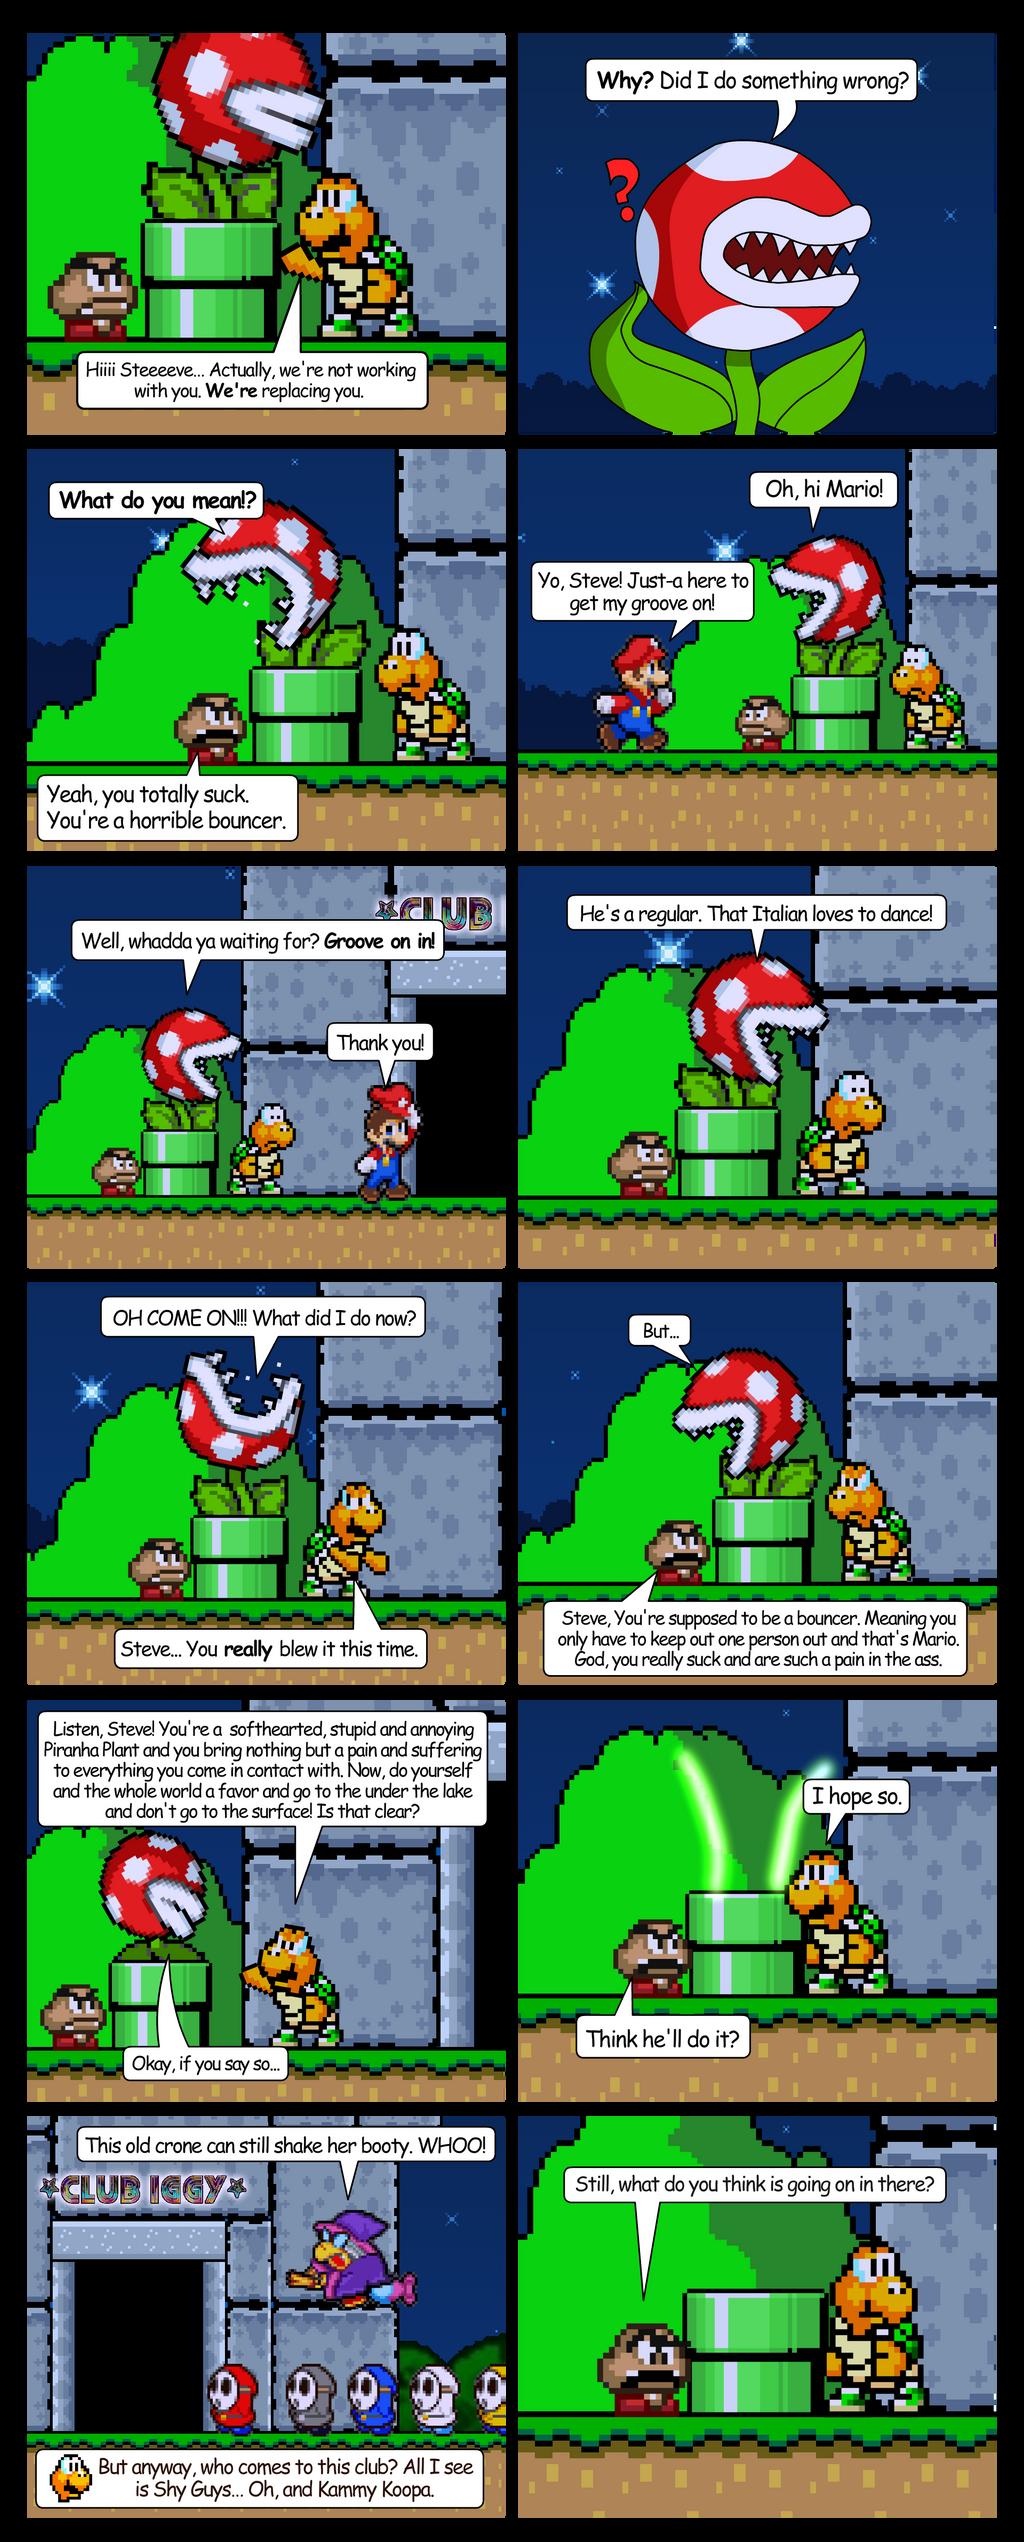 Bowser's Kingdom Episode 4 - Page 02 by AsylusGoji91 on